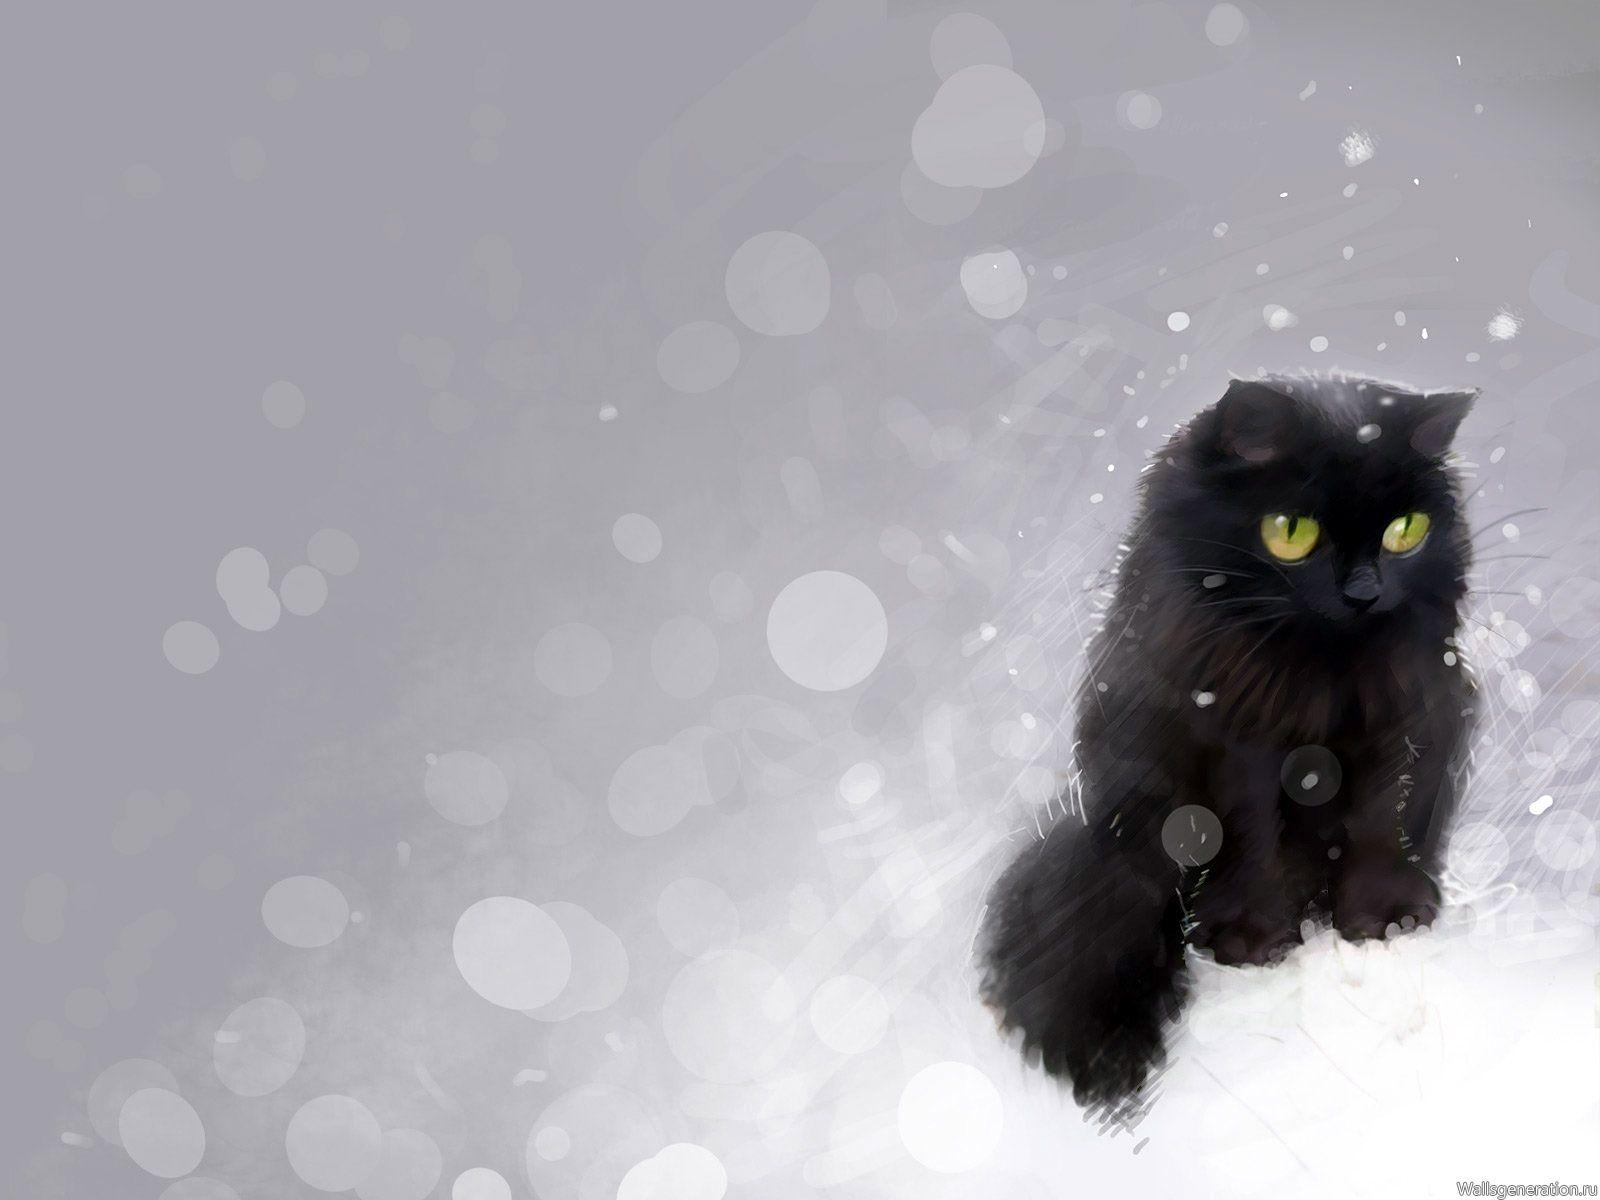 обои на рабочий стол, кот, кошка, котенок и снег